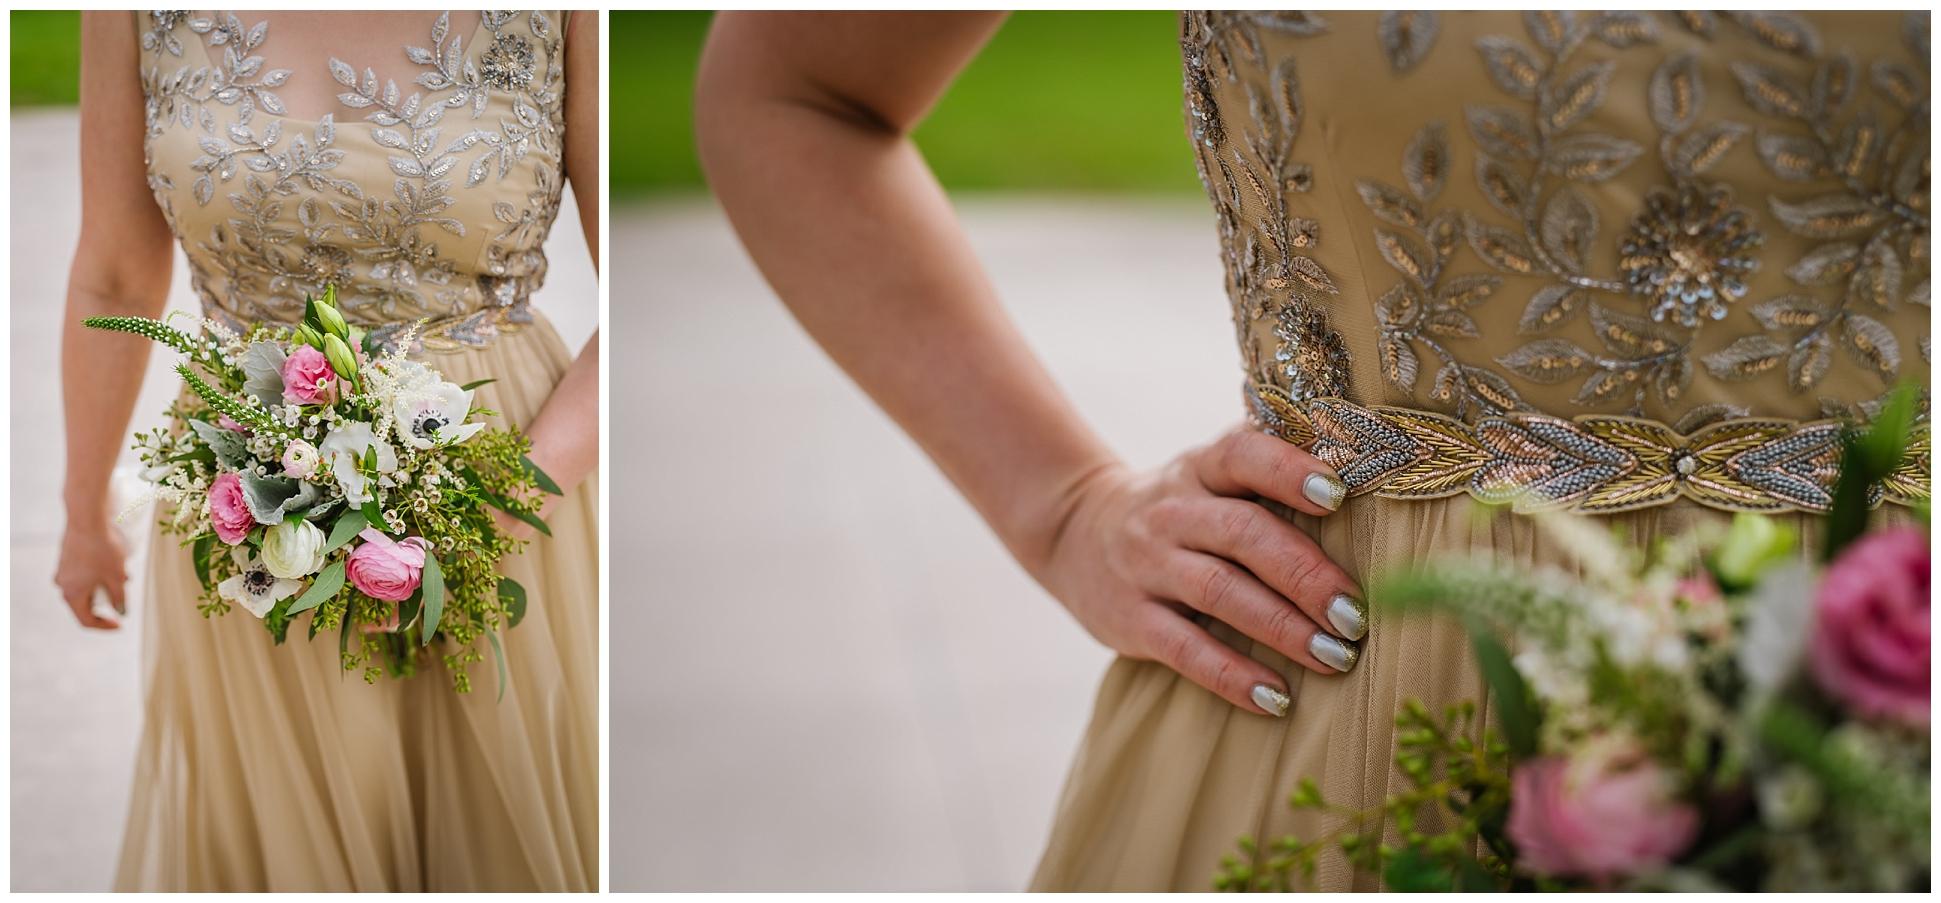 st-pete-wedding-photographer-italian-romance-theme-rustic-flower-crown_0413.jpg